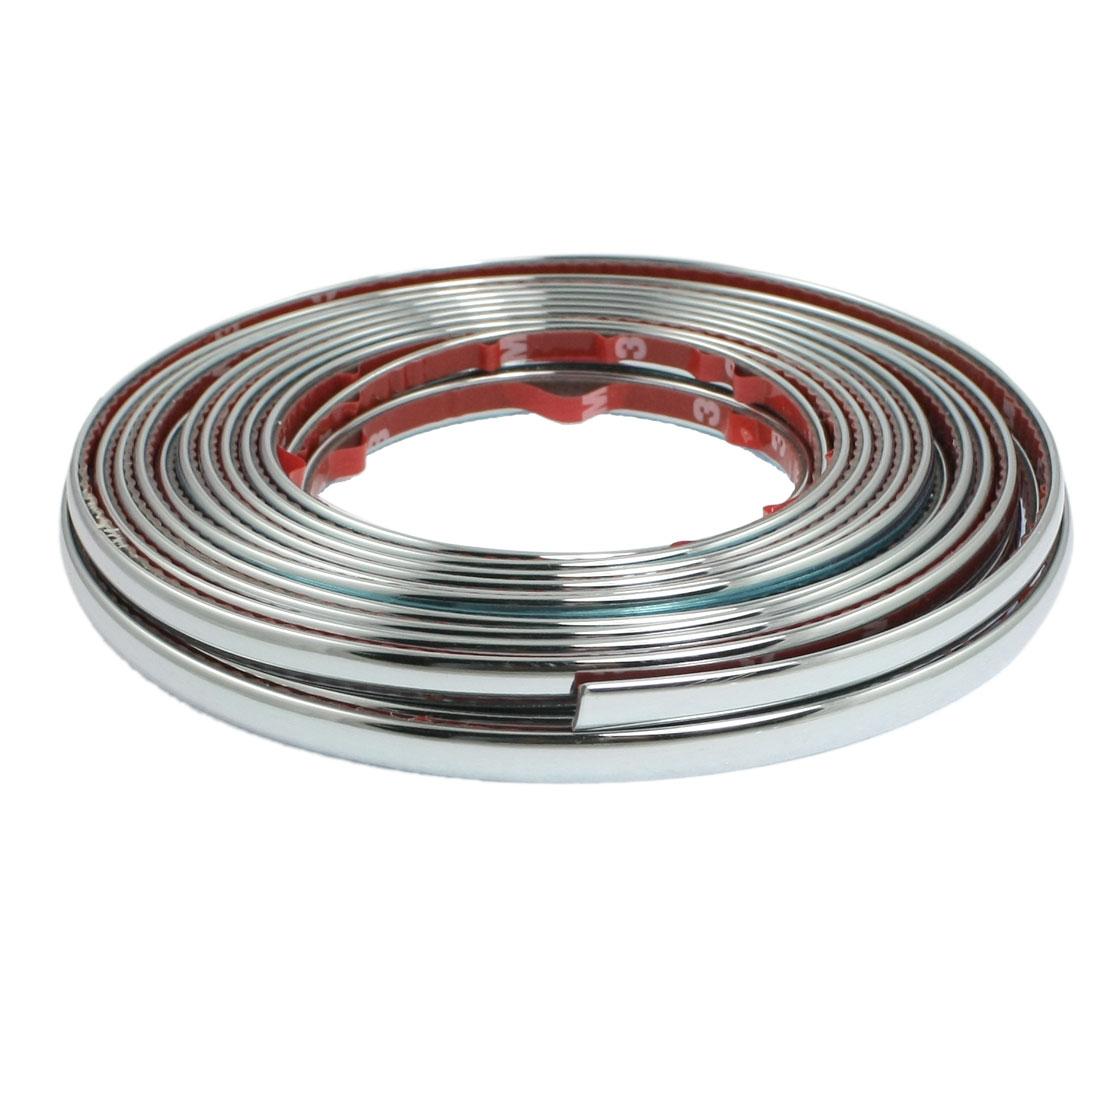 Car Window Silver Tone Soft PVC Adhesive Back Moulding Trim Strip Line 8M x 8mm